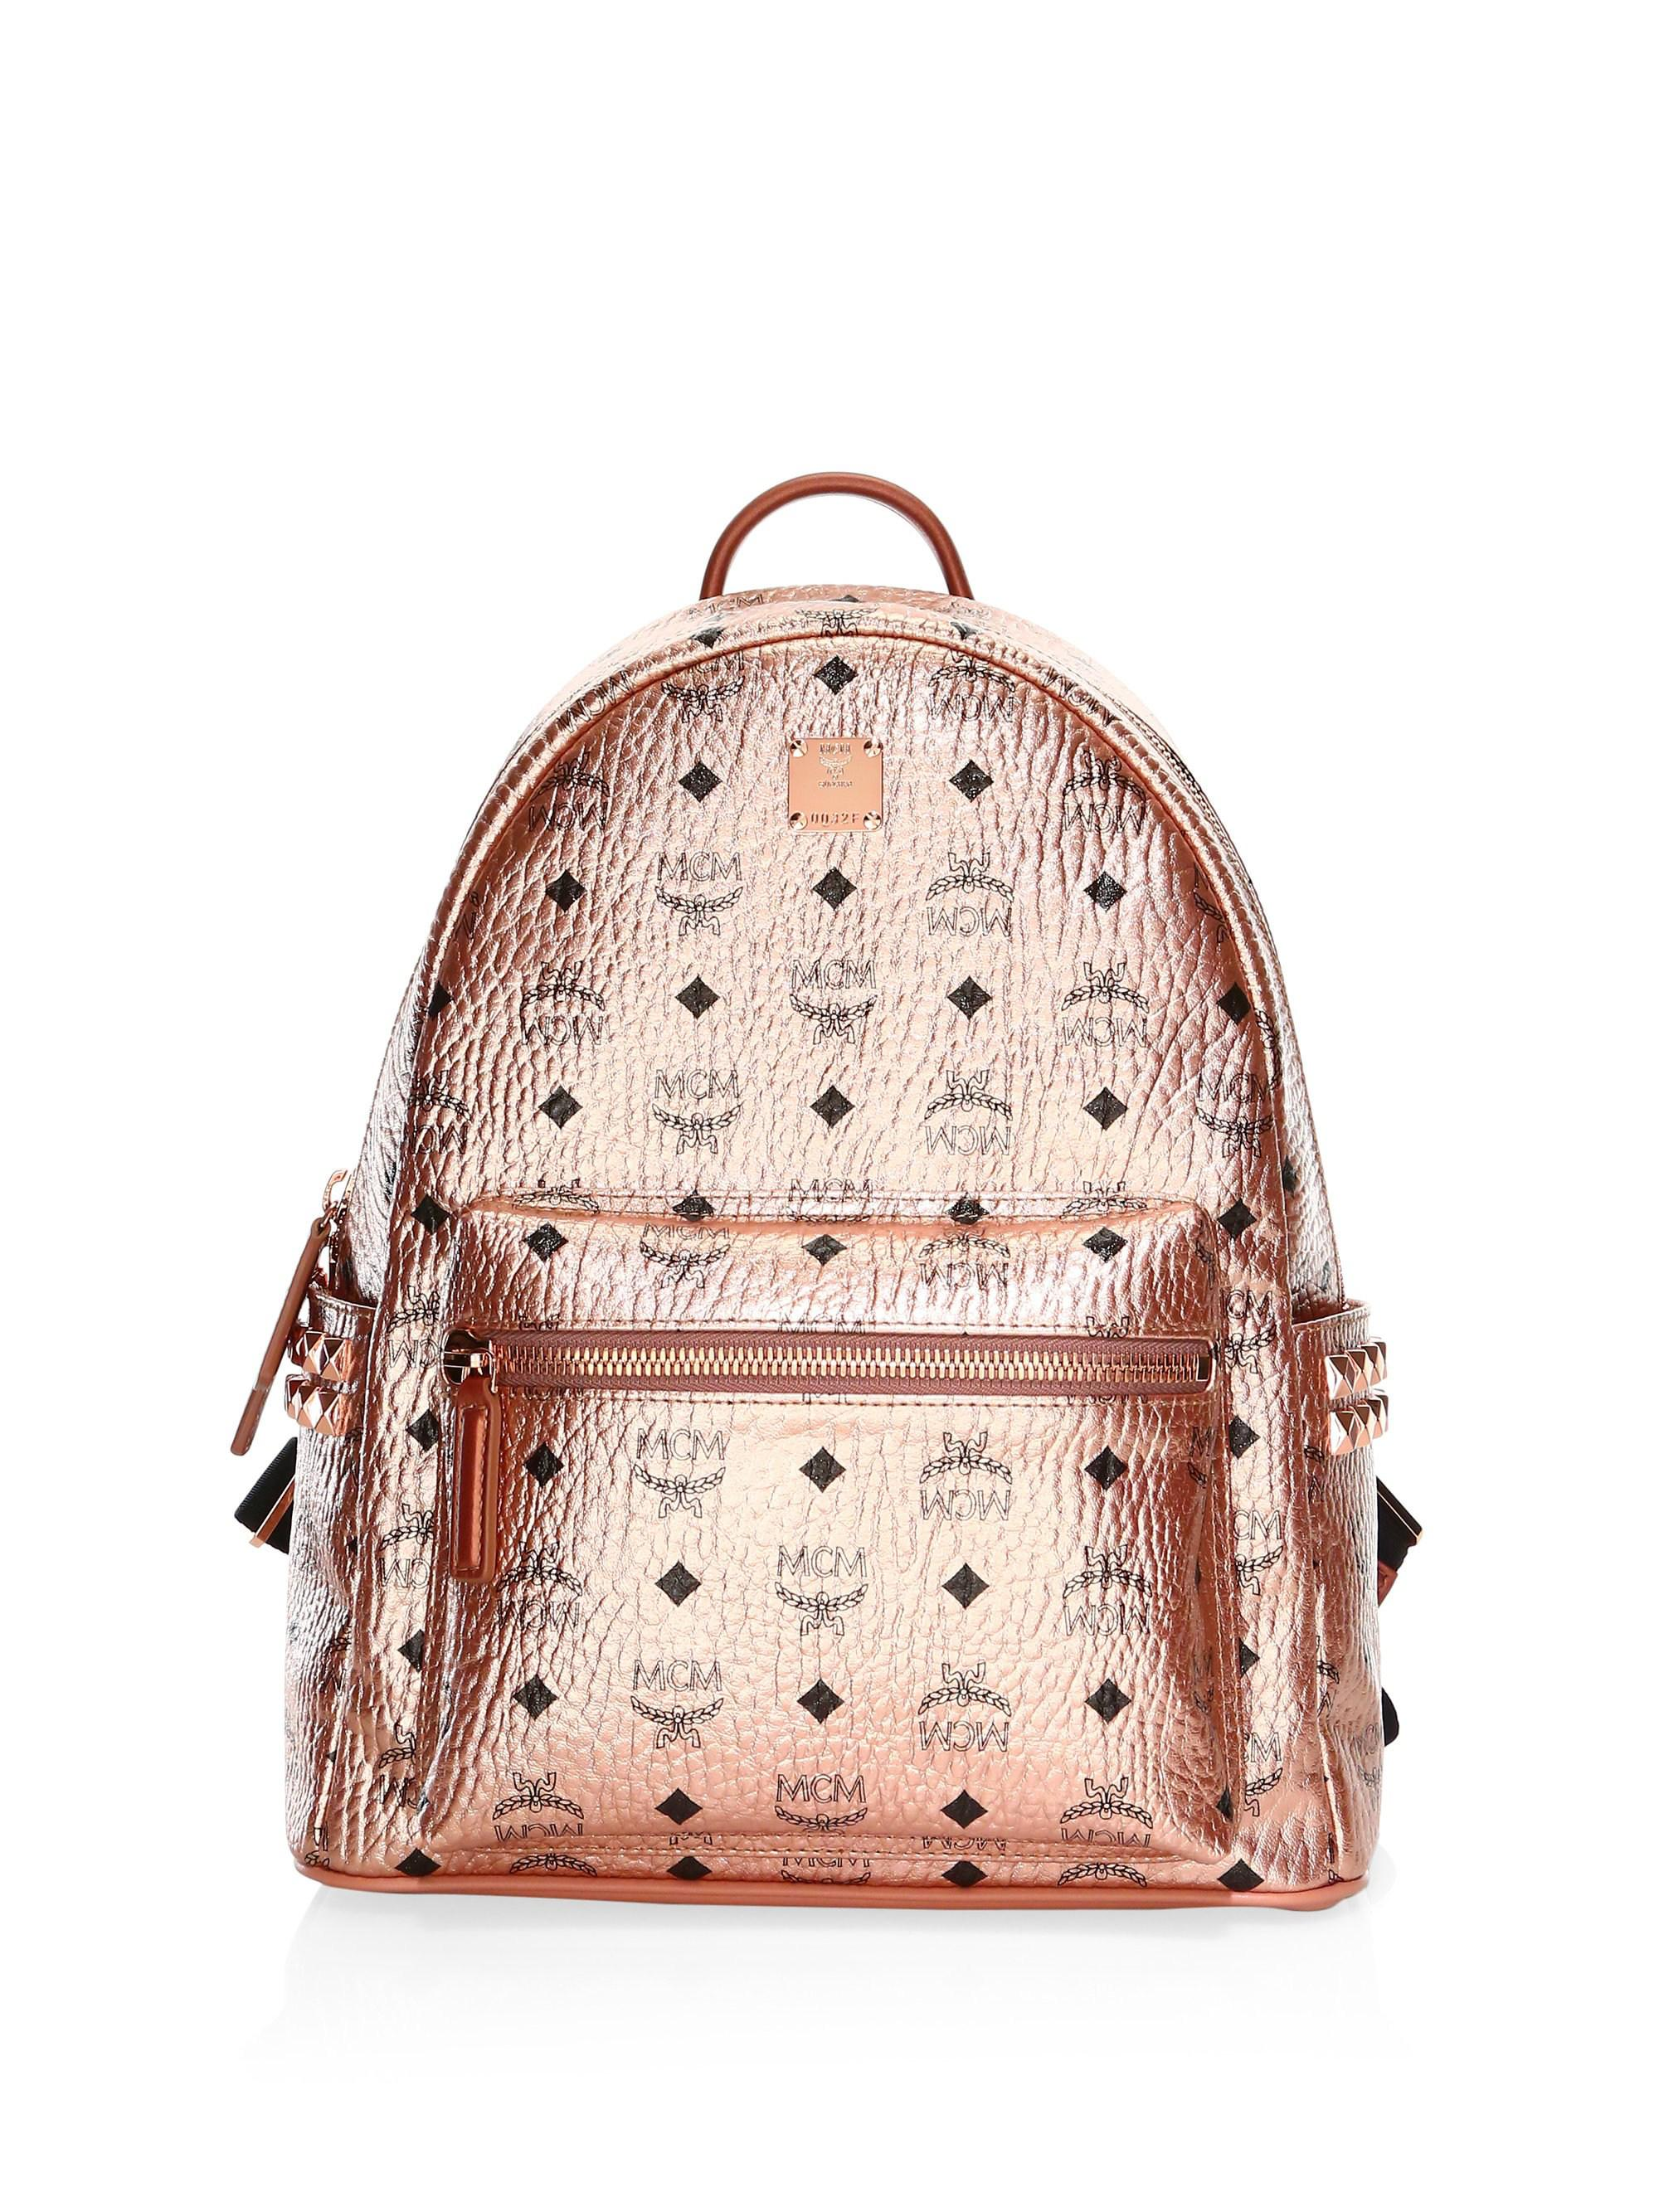 MCM. Women s Small-medium Stark Metallic Backpack 6f3d8fae0aef0